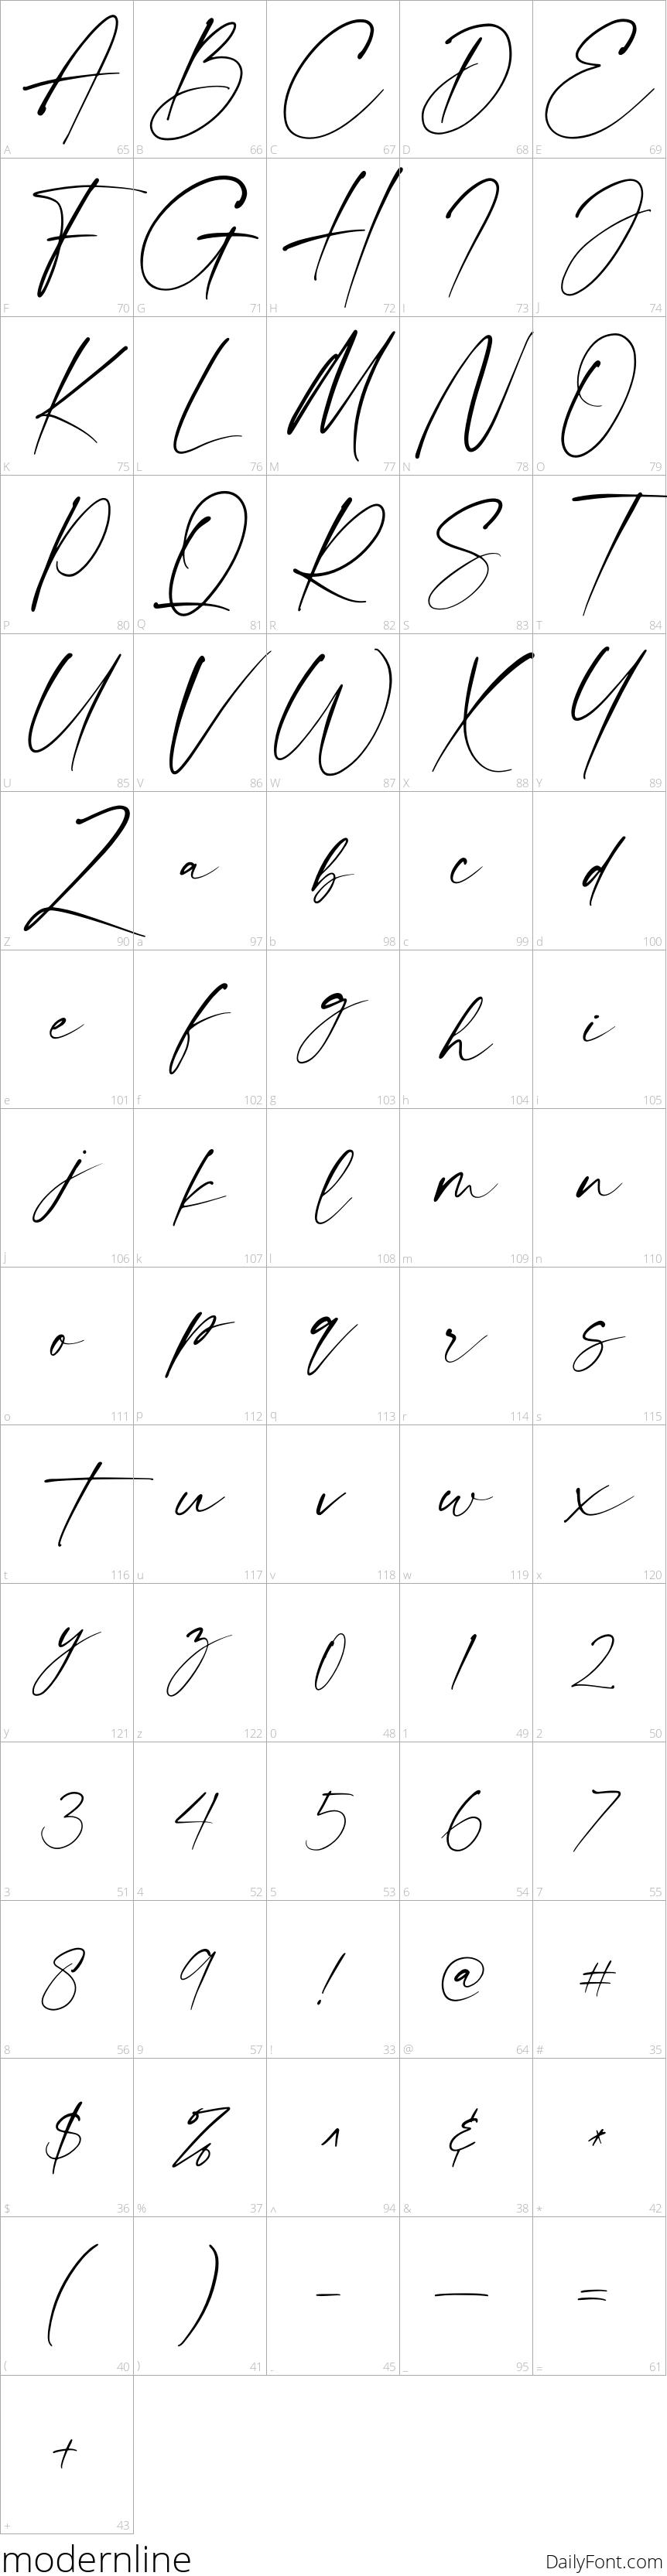 modernline character map